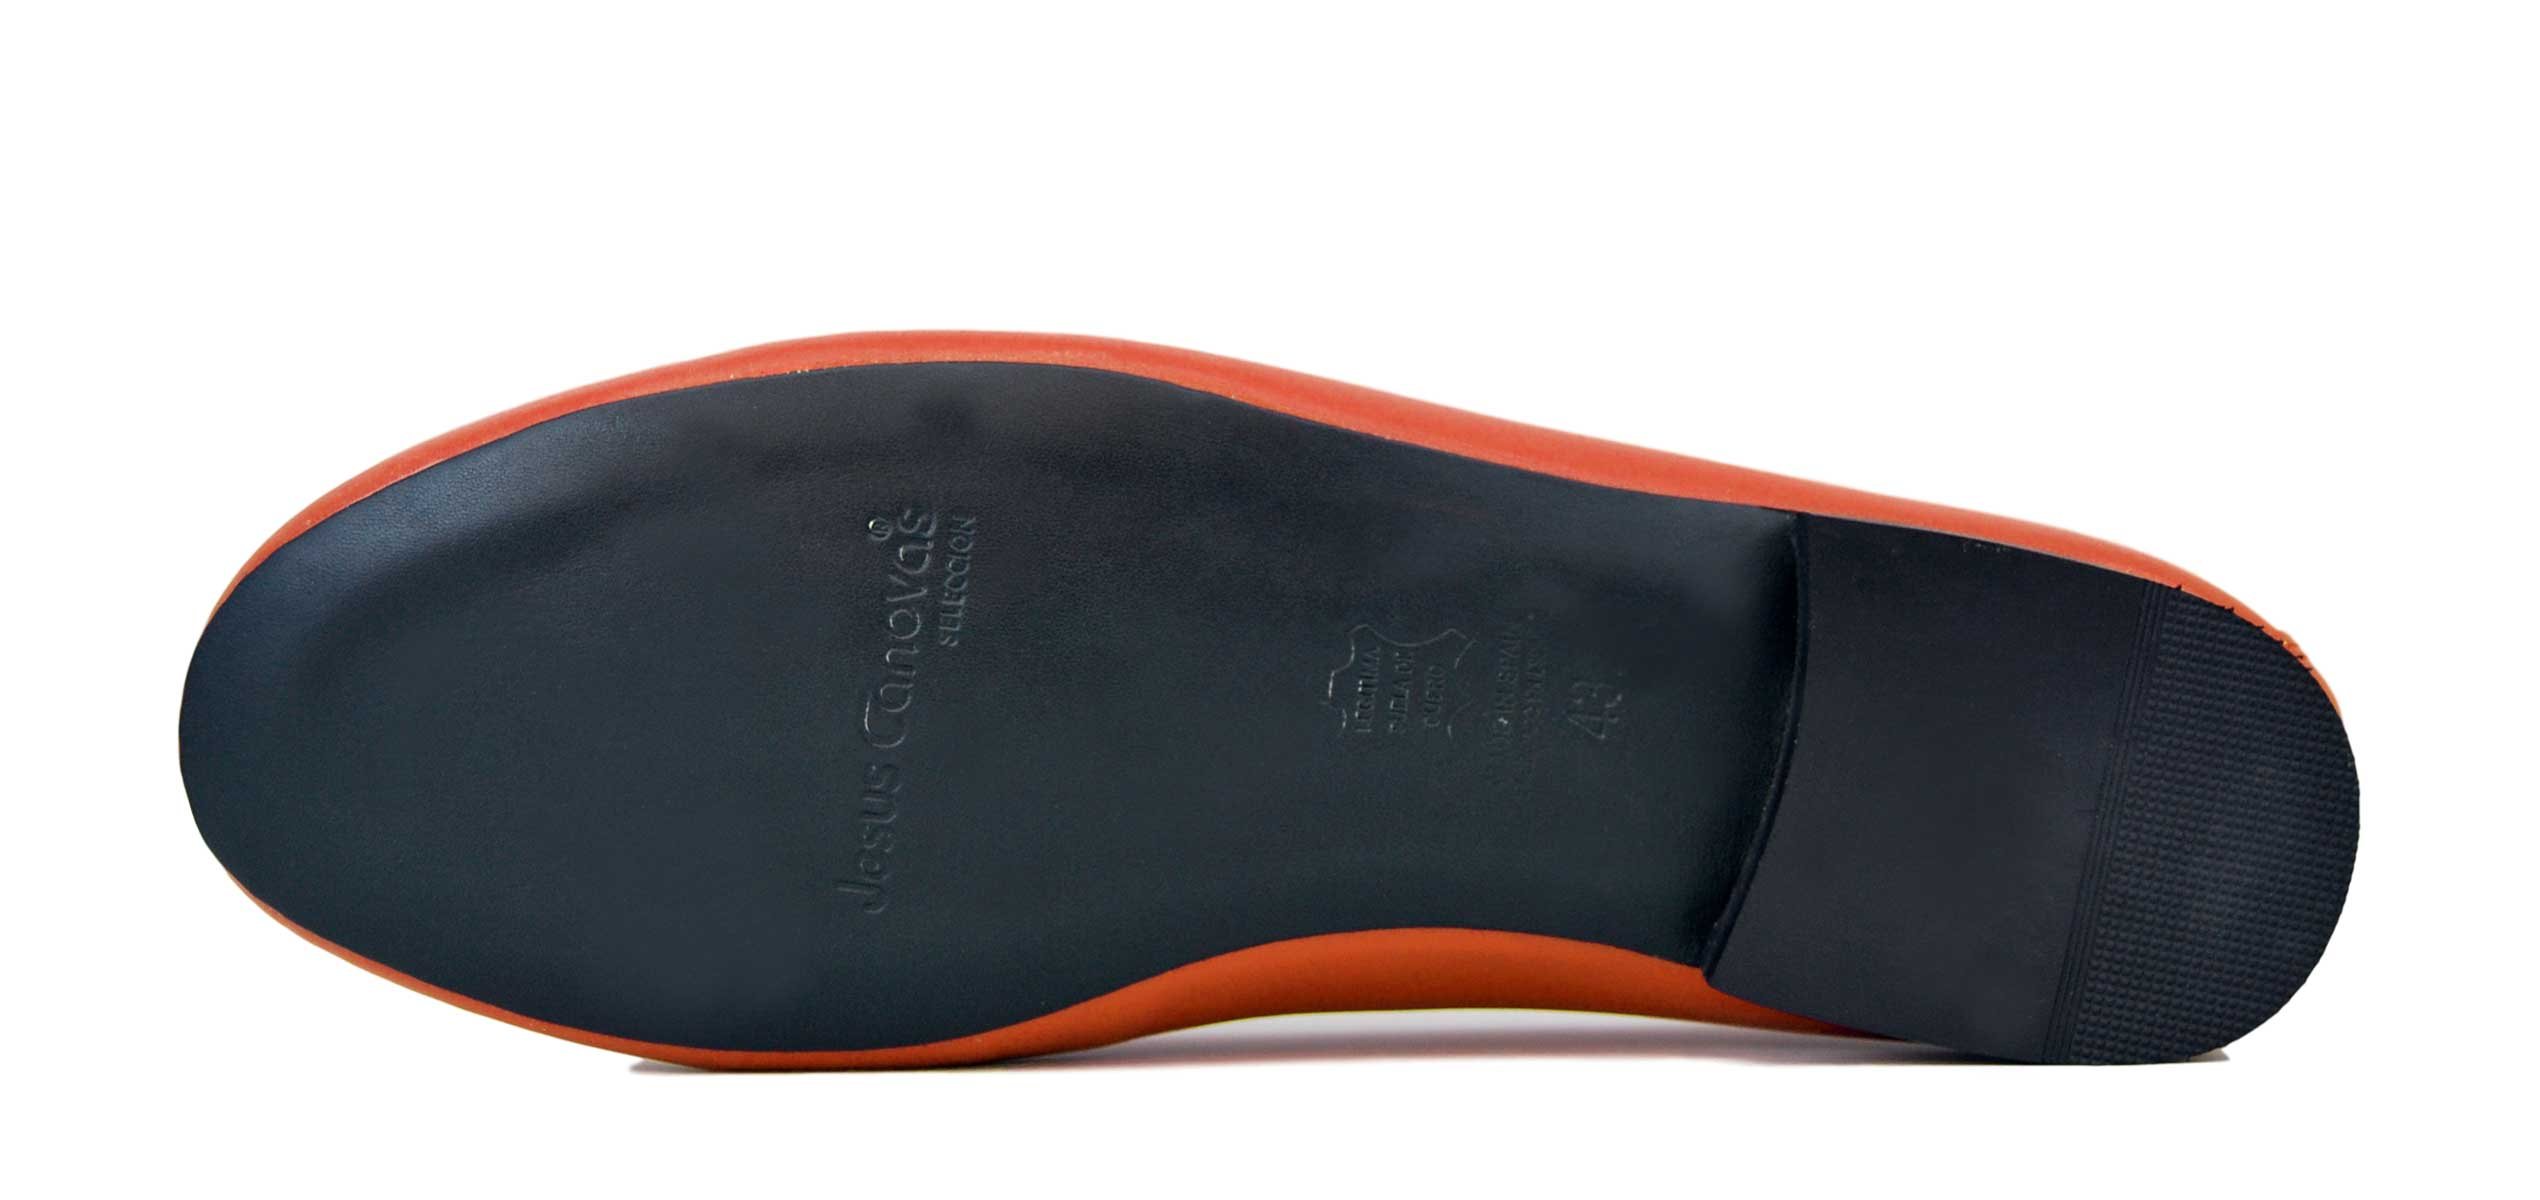 Foto 3 de Zapatos Julio Iglesias Mocasin 528 JC Naranja Napa